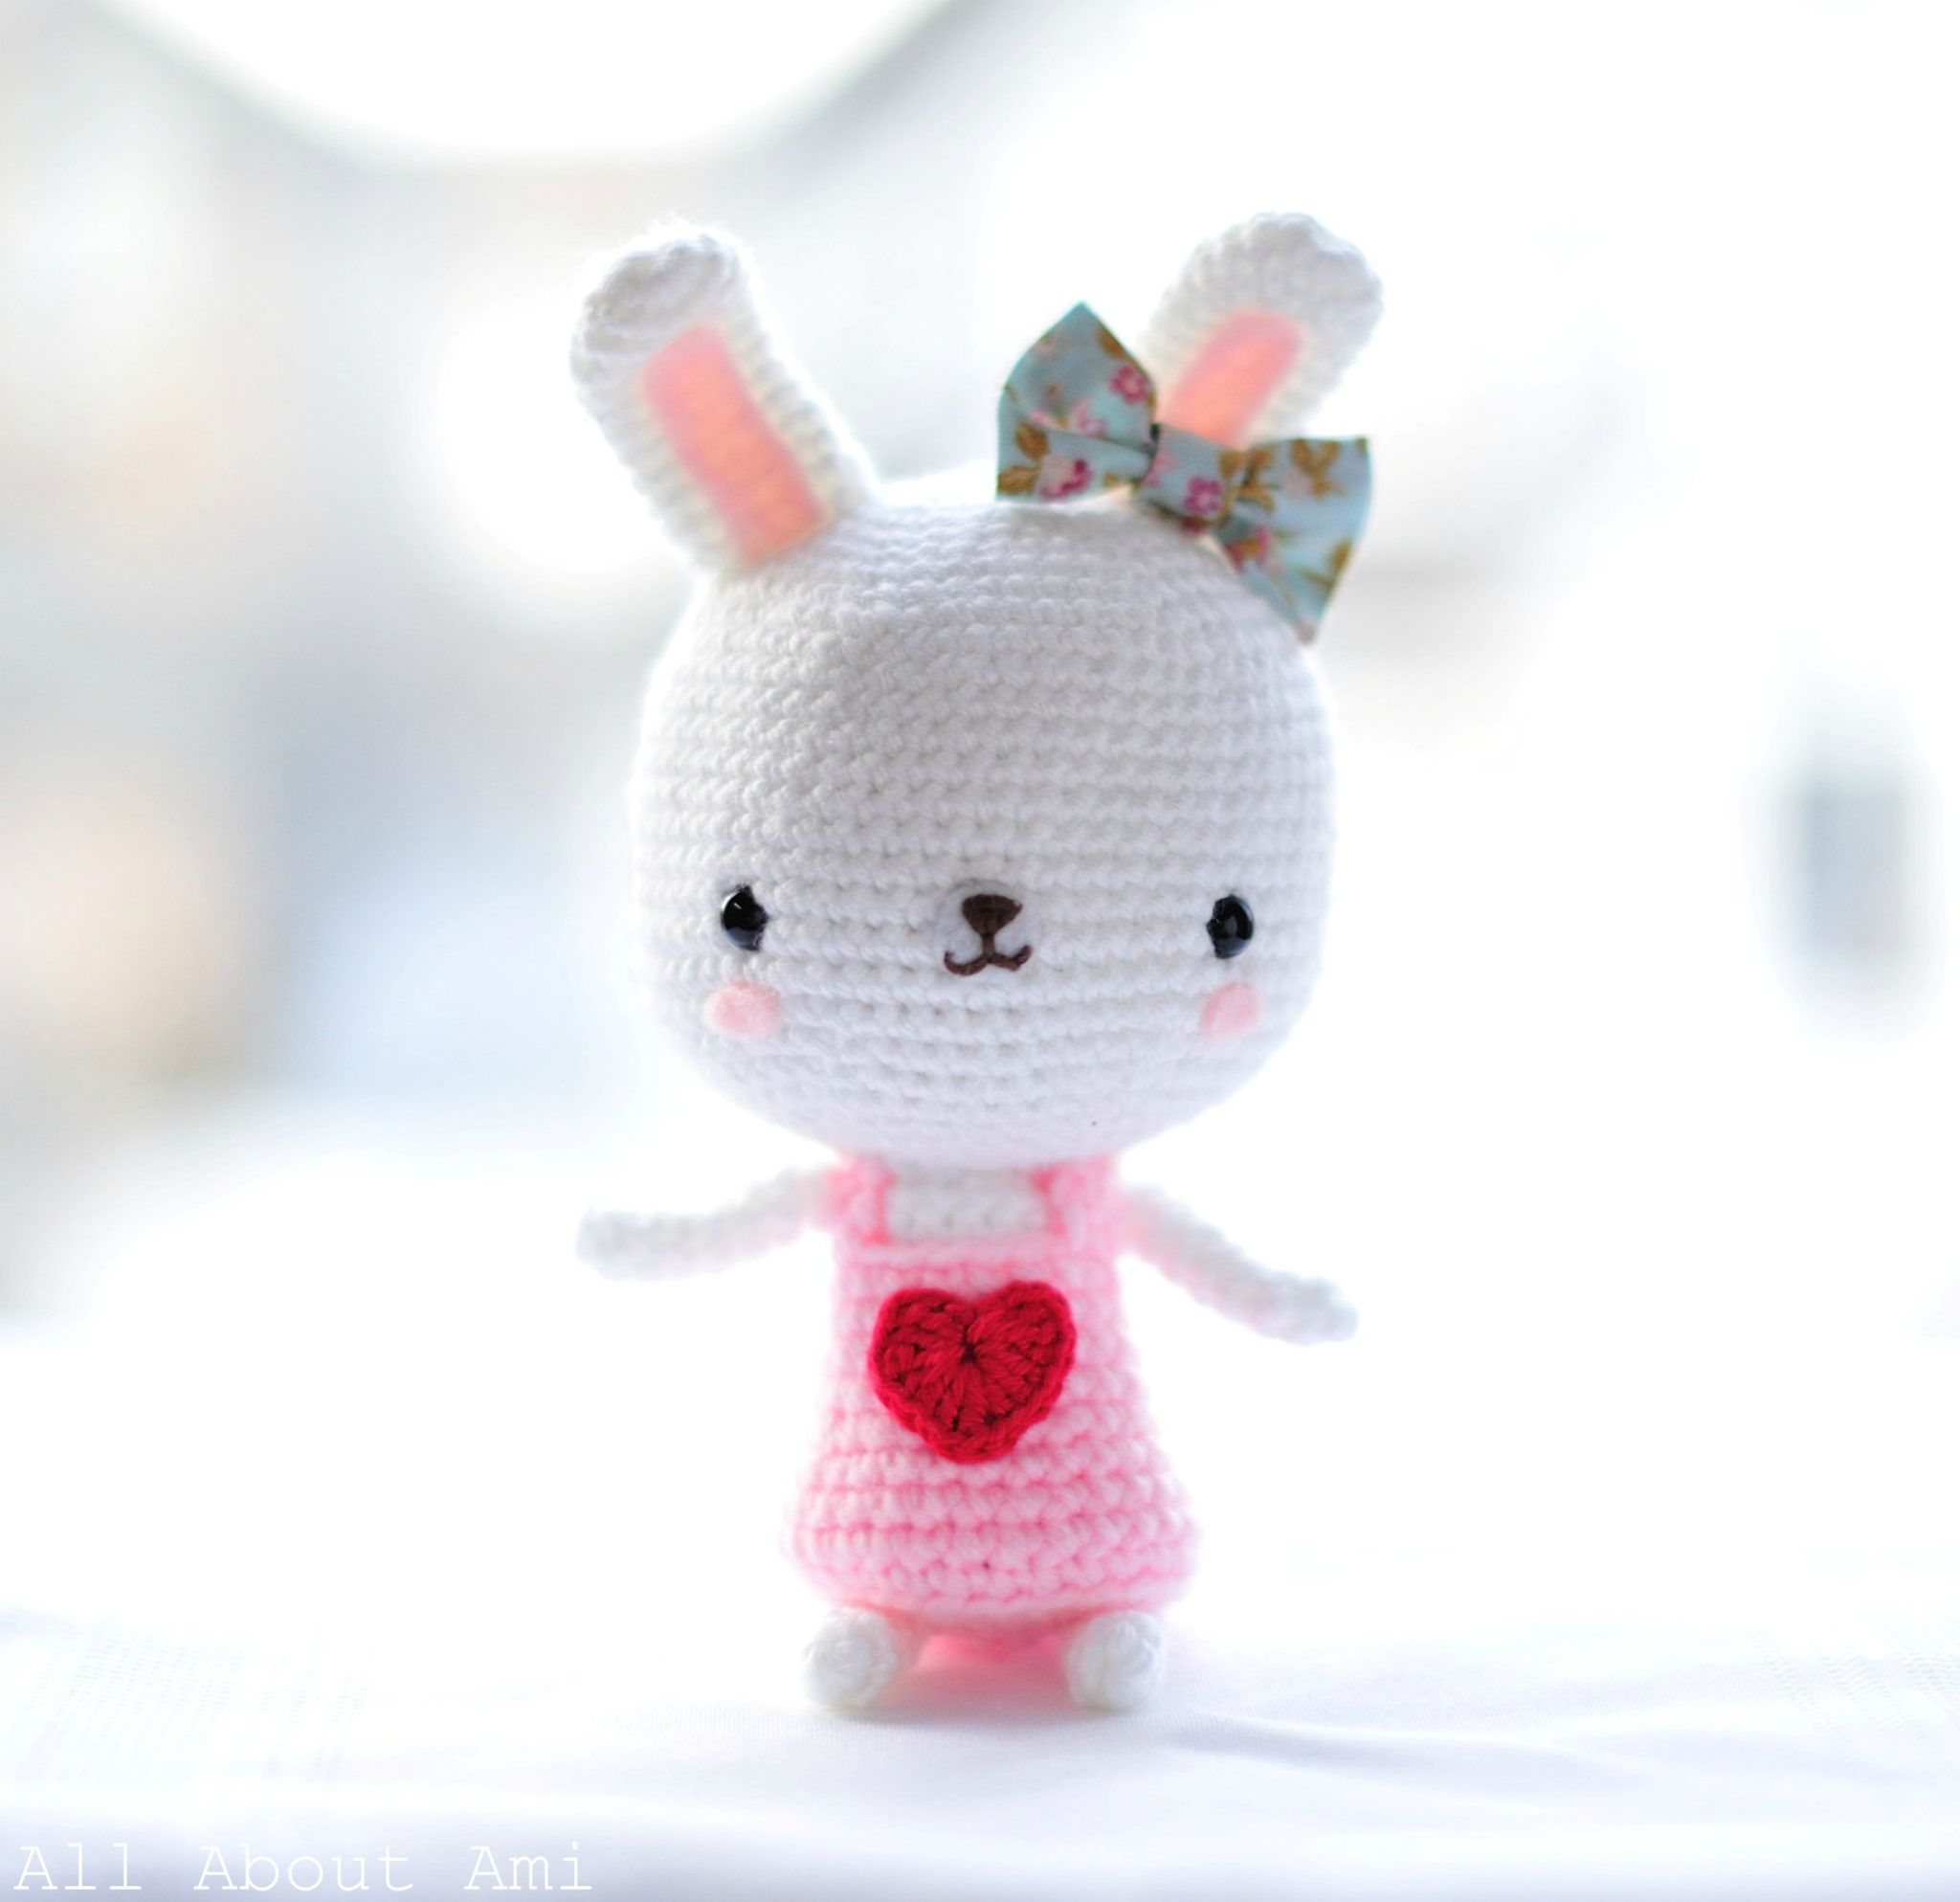 crochet toys and other ideas | Pinterest